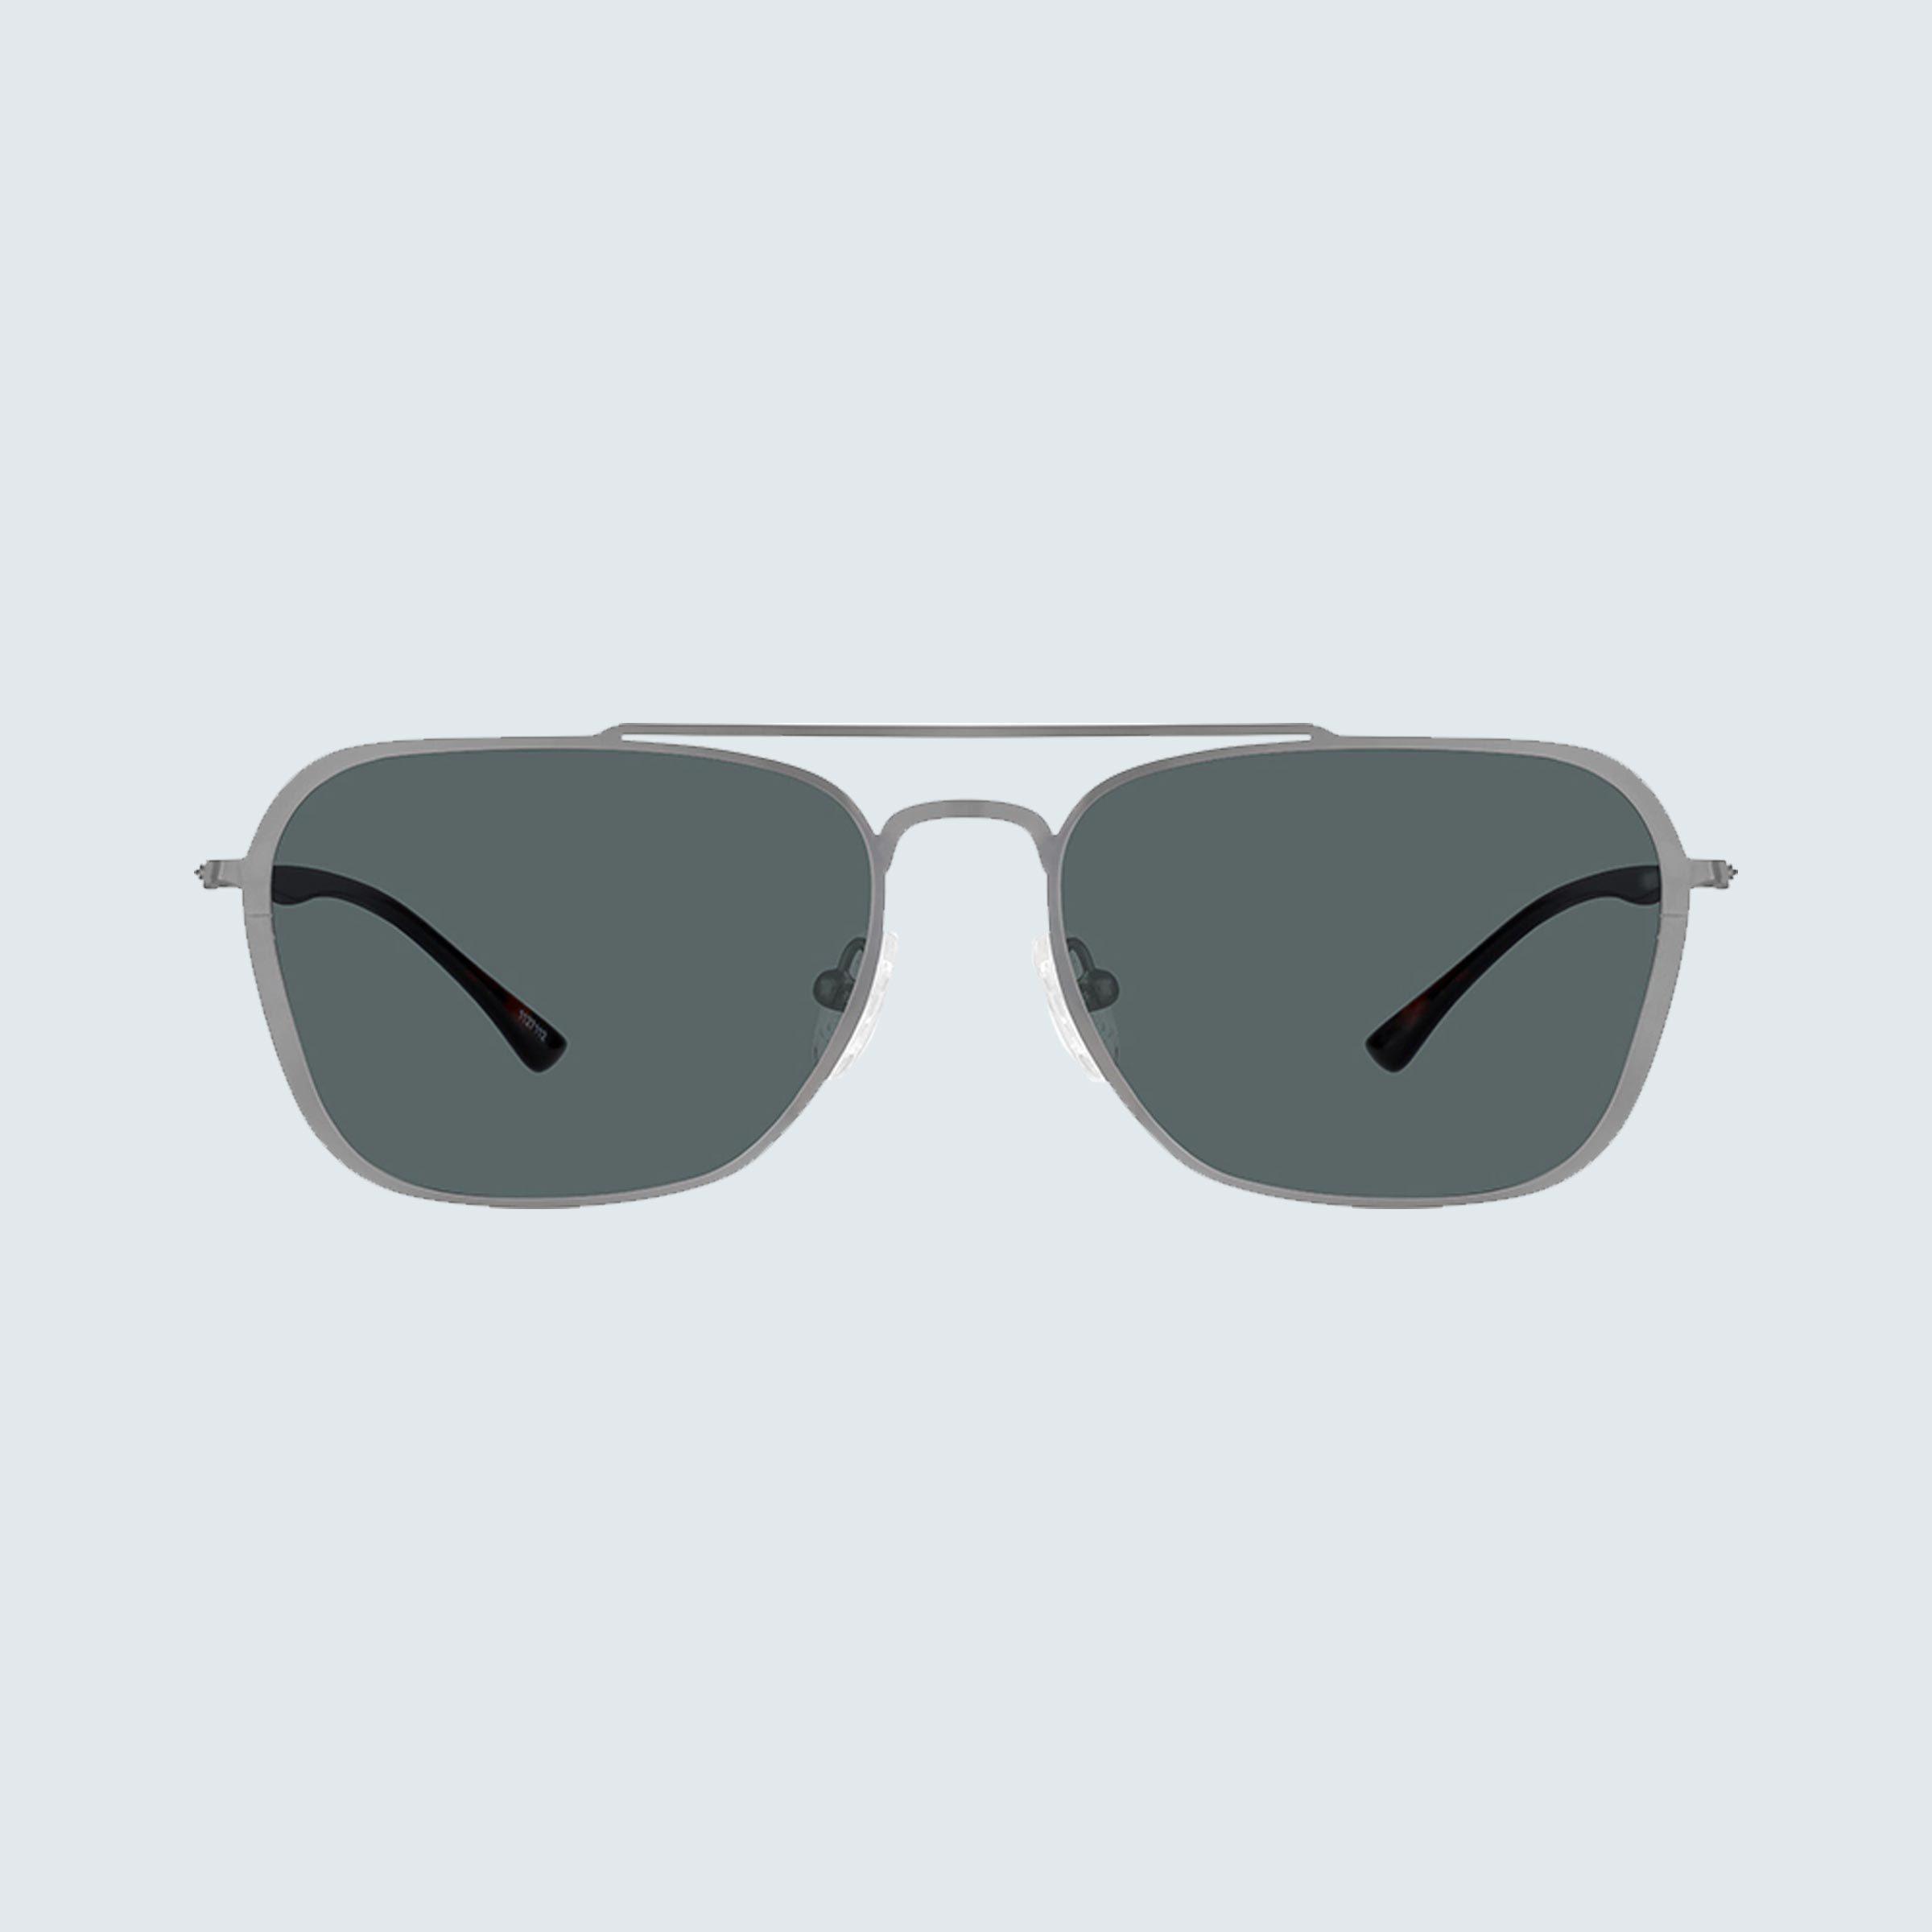 Best cheap sunglasses for men with prescriptions